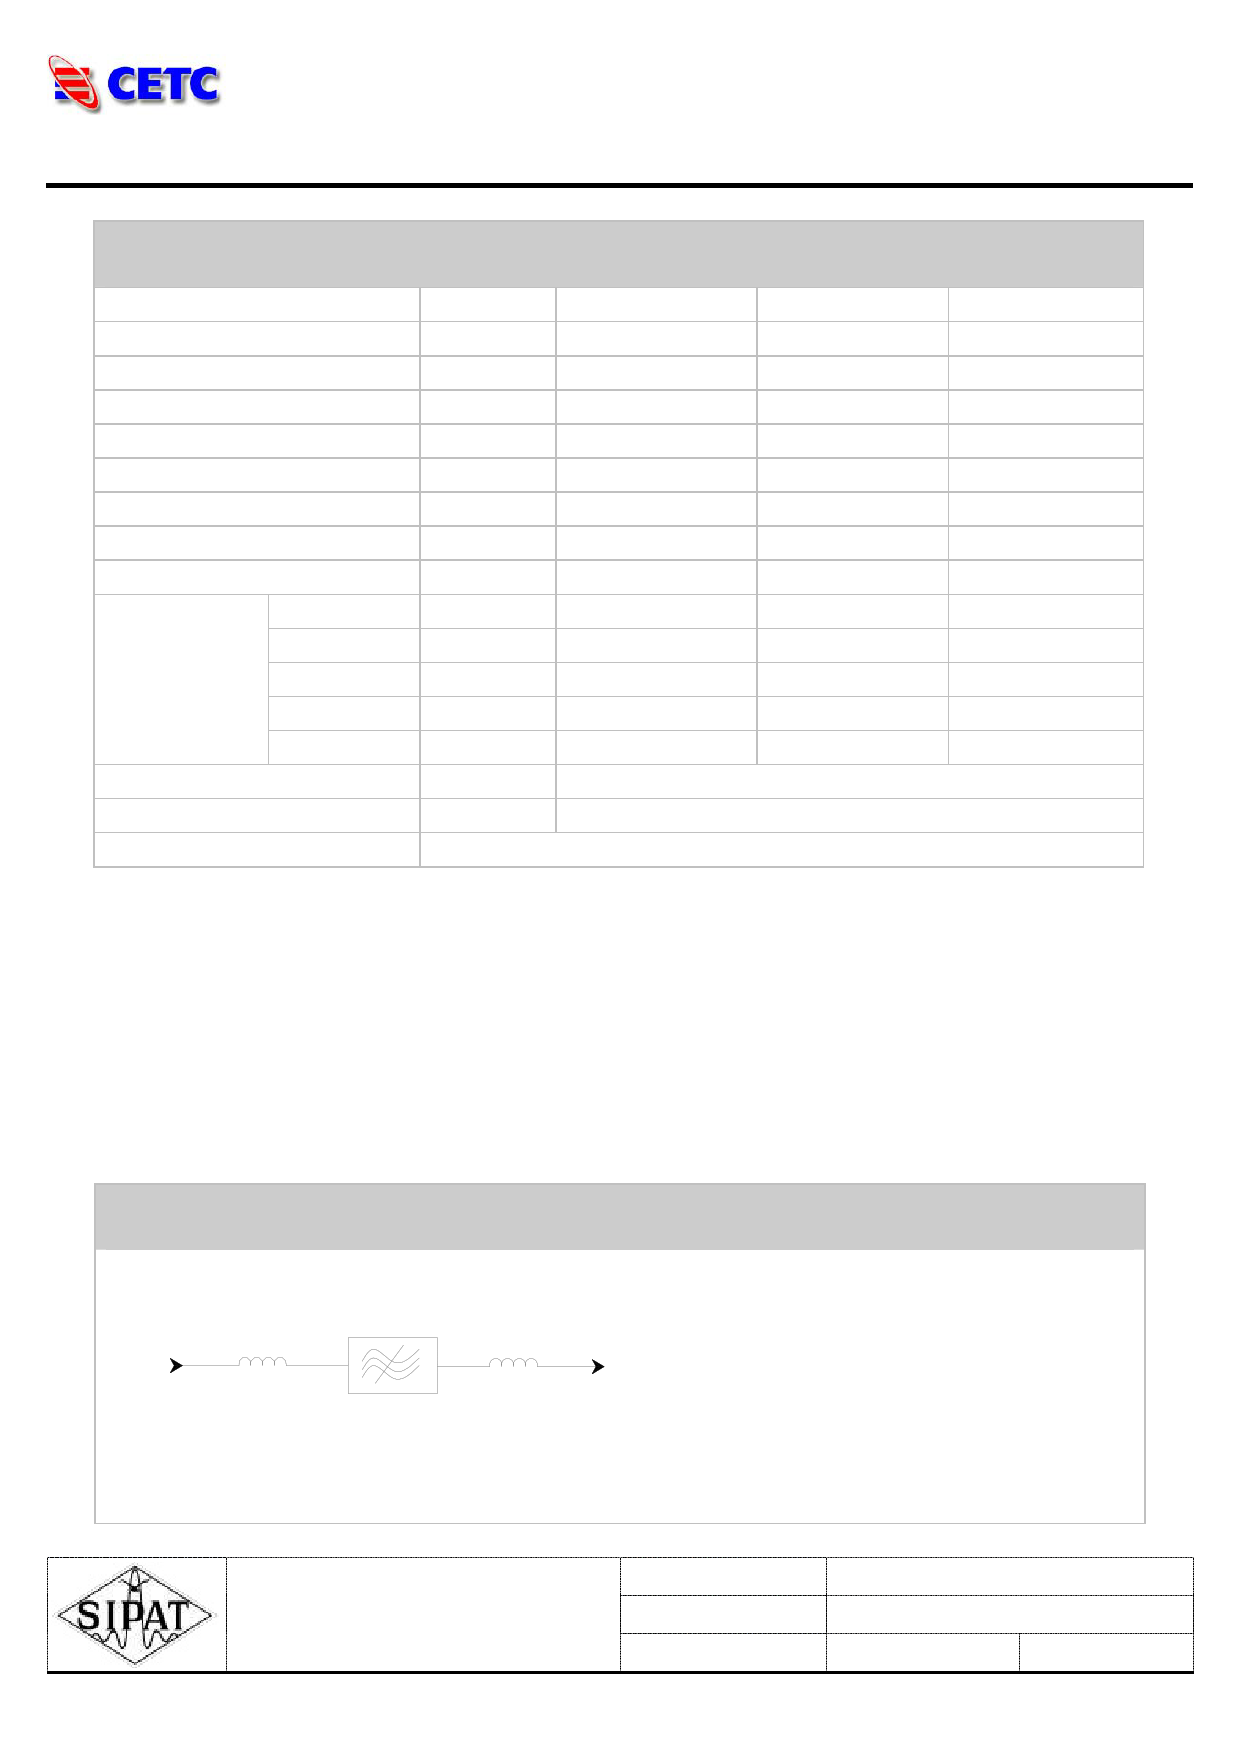 LBN70A28 datasheet